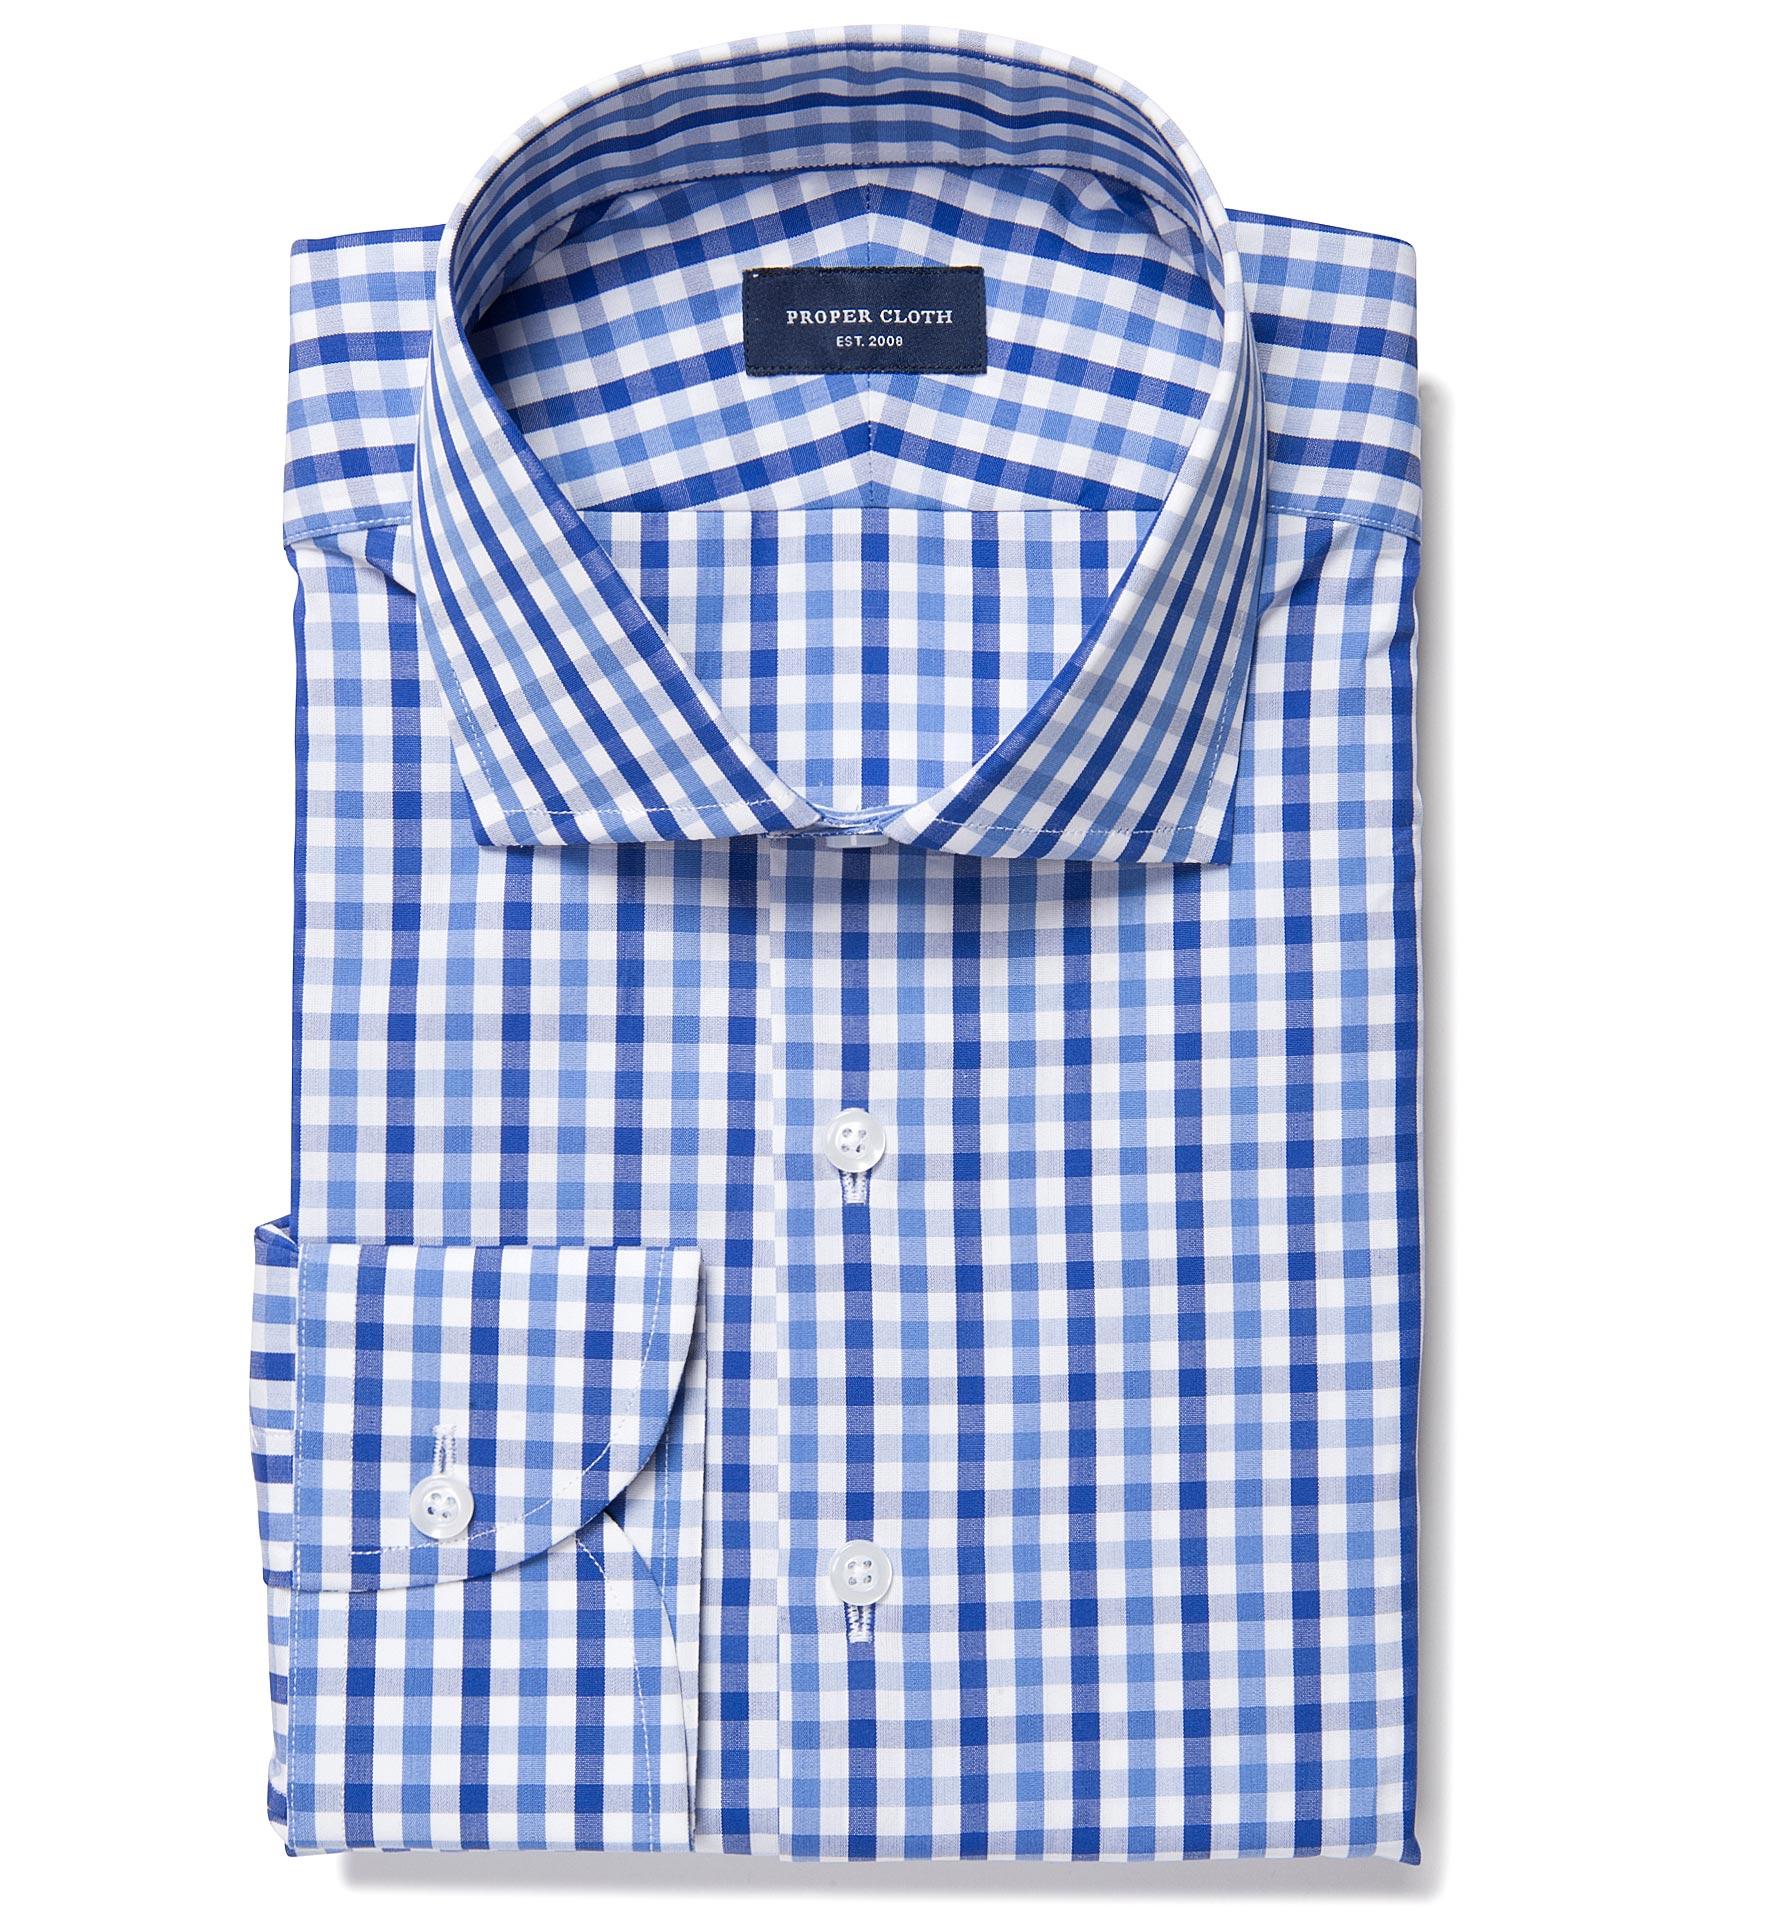 Thomas mason blue multi gingham custom dress shirt by for Thomas mason dress shirts